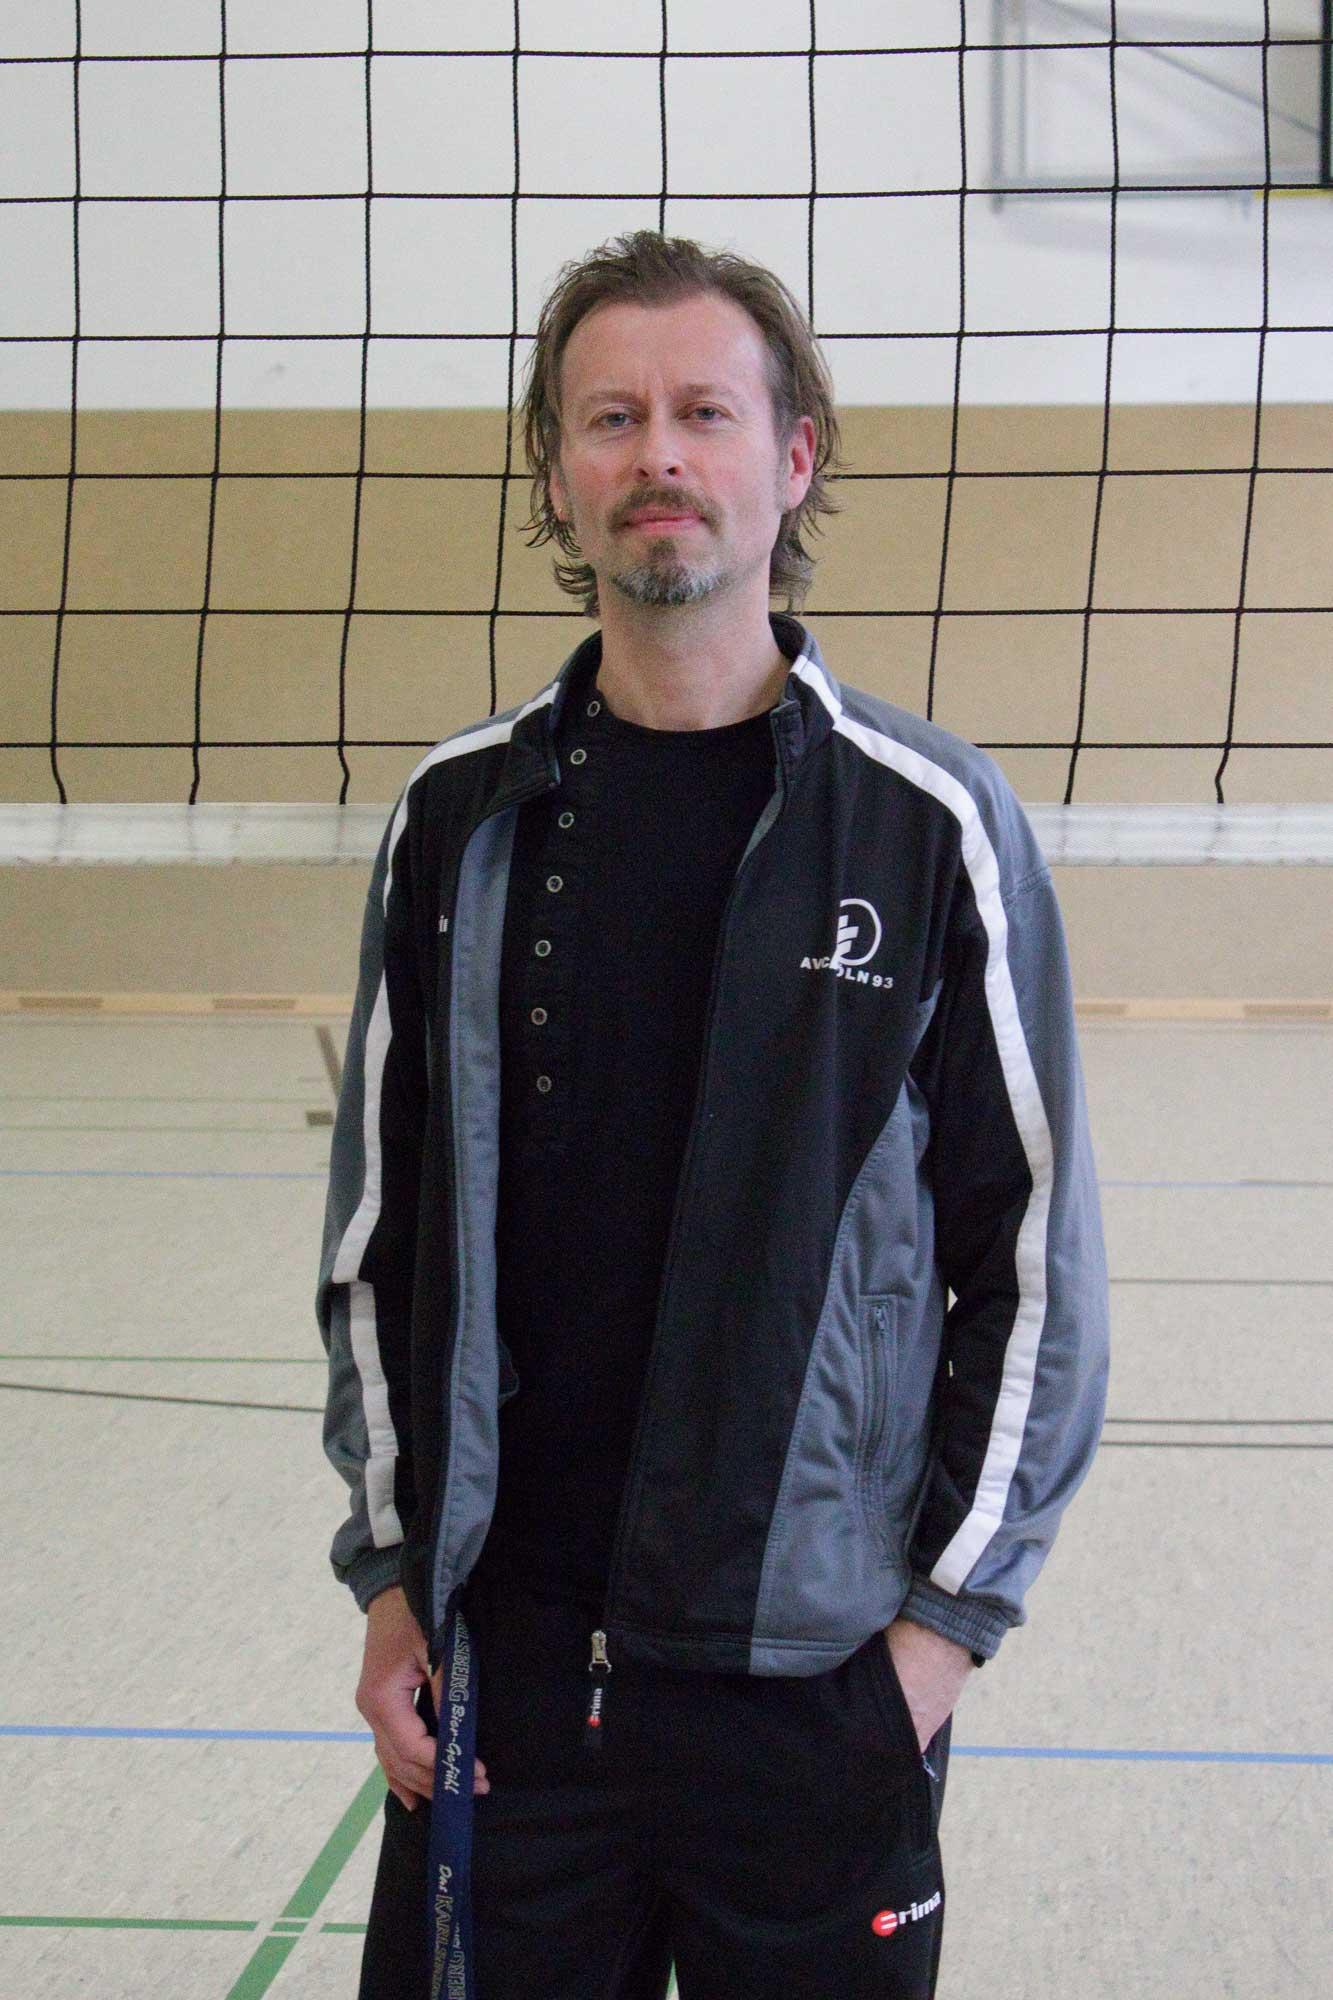 Patrick Tetzlaff